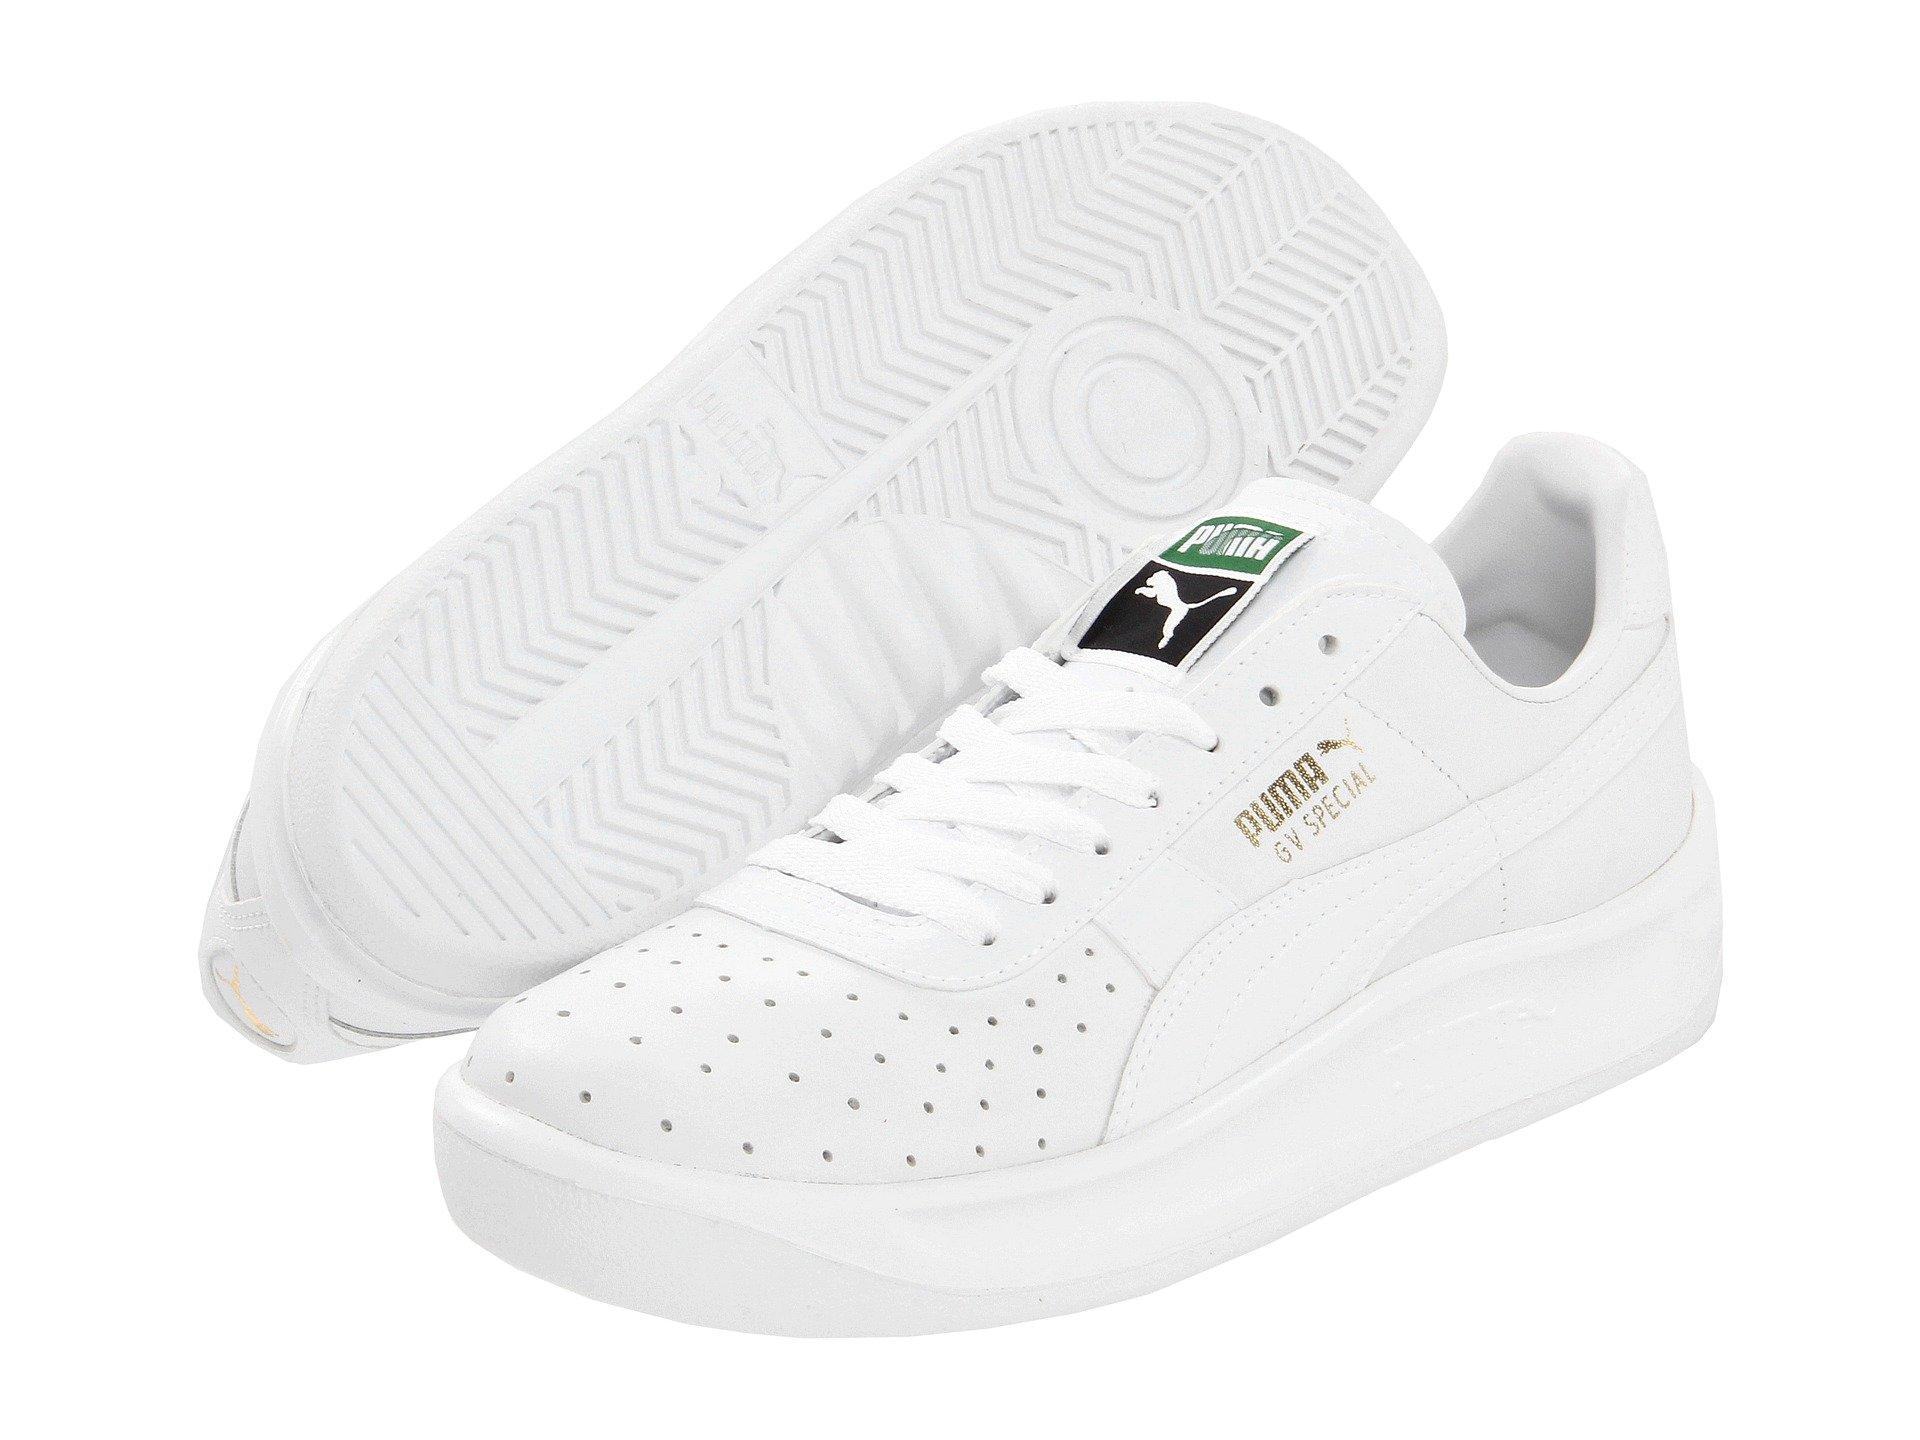 Pumas Shoes White Felt